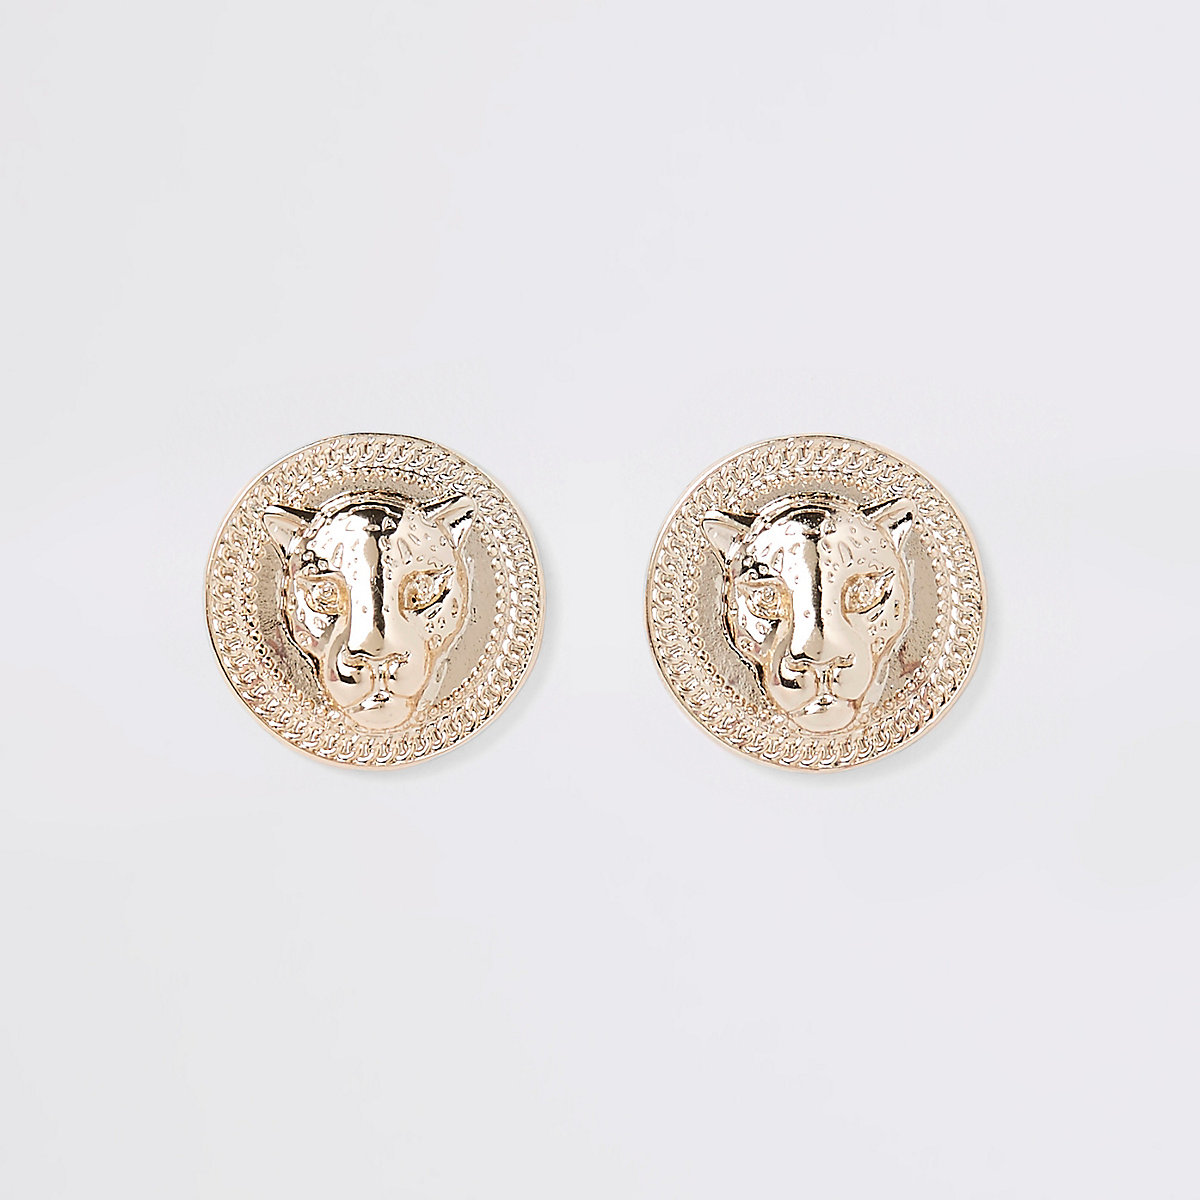 Gold tone jaguar stud earrings